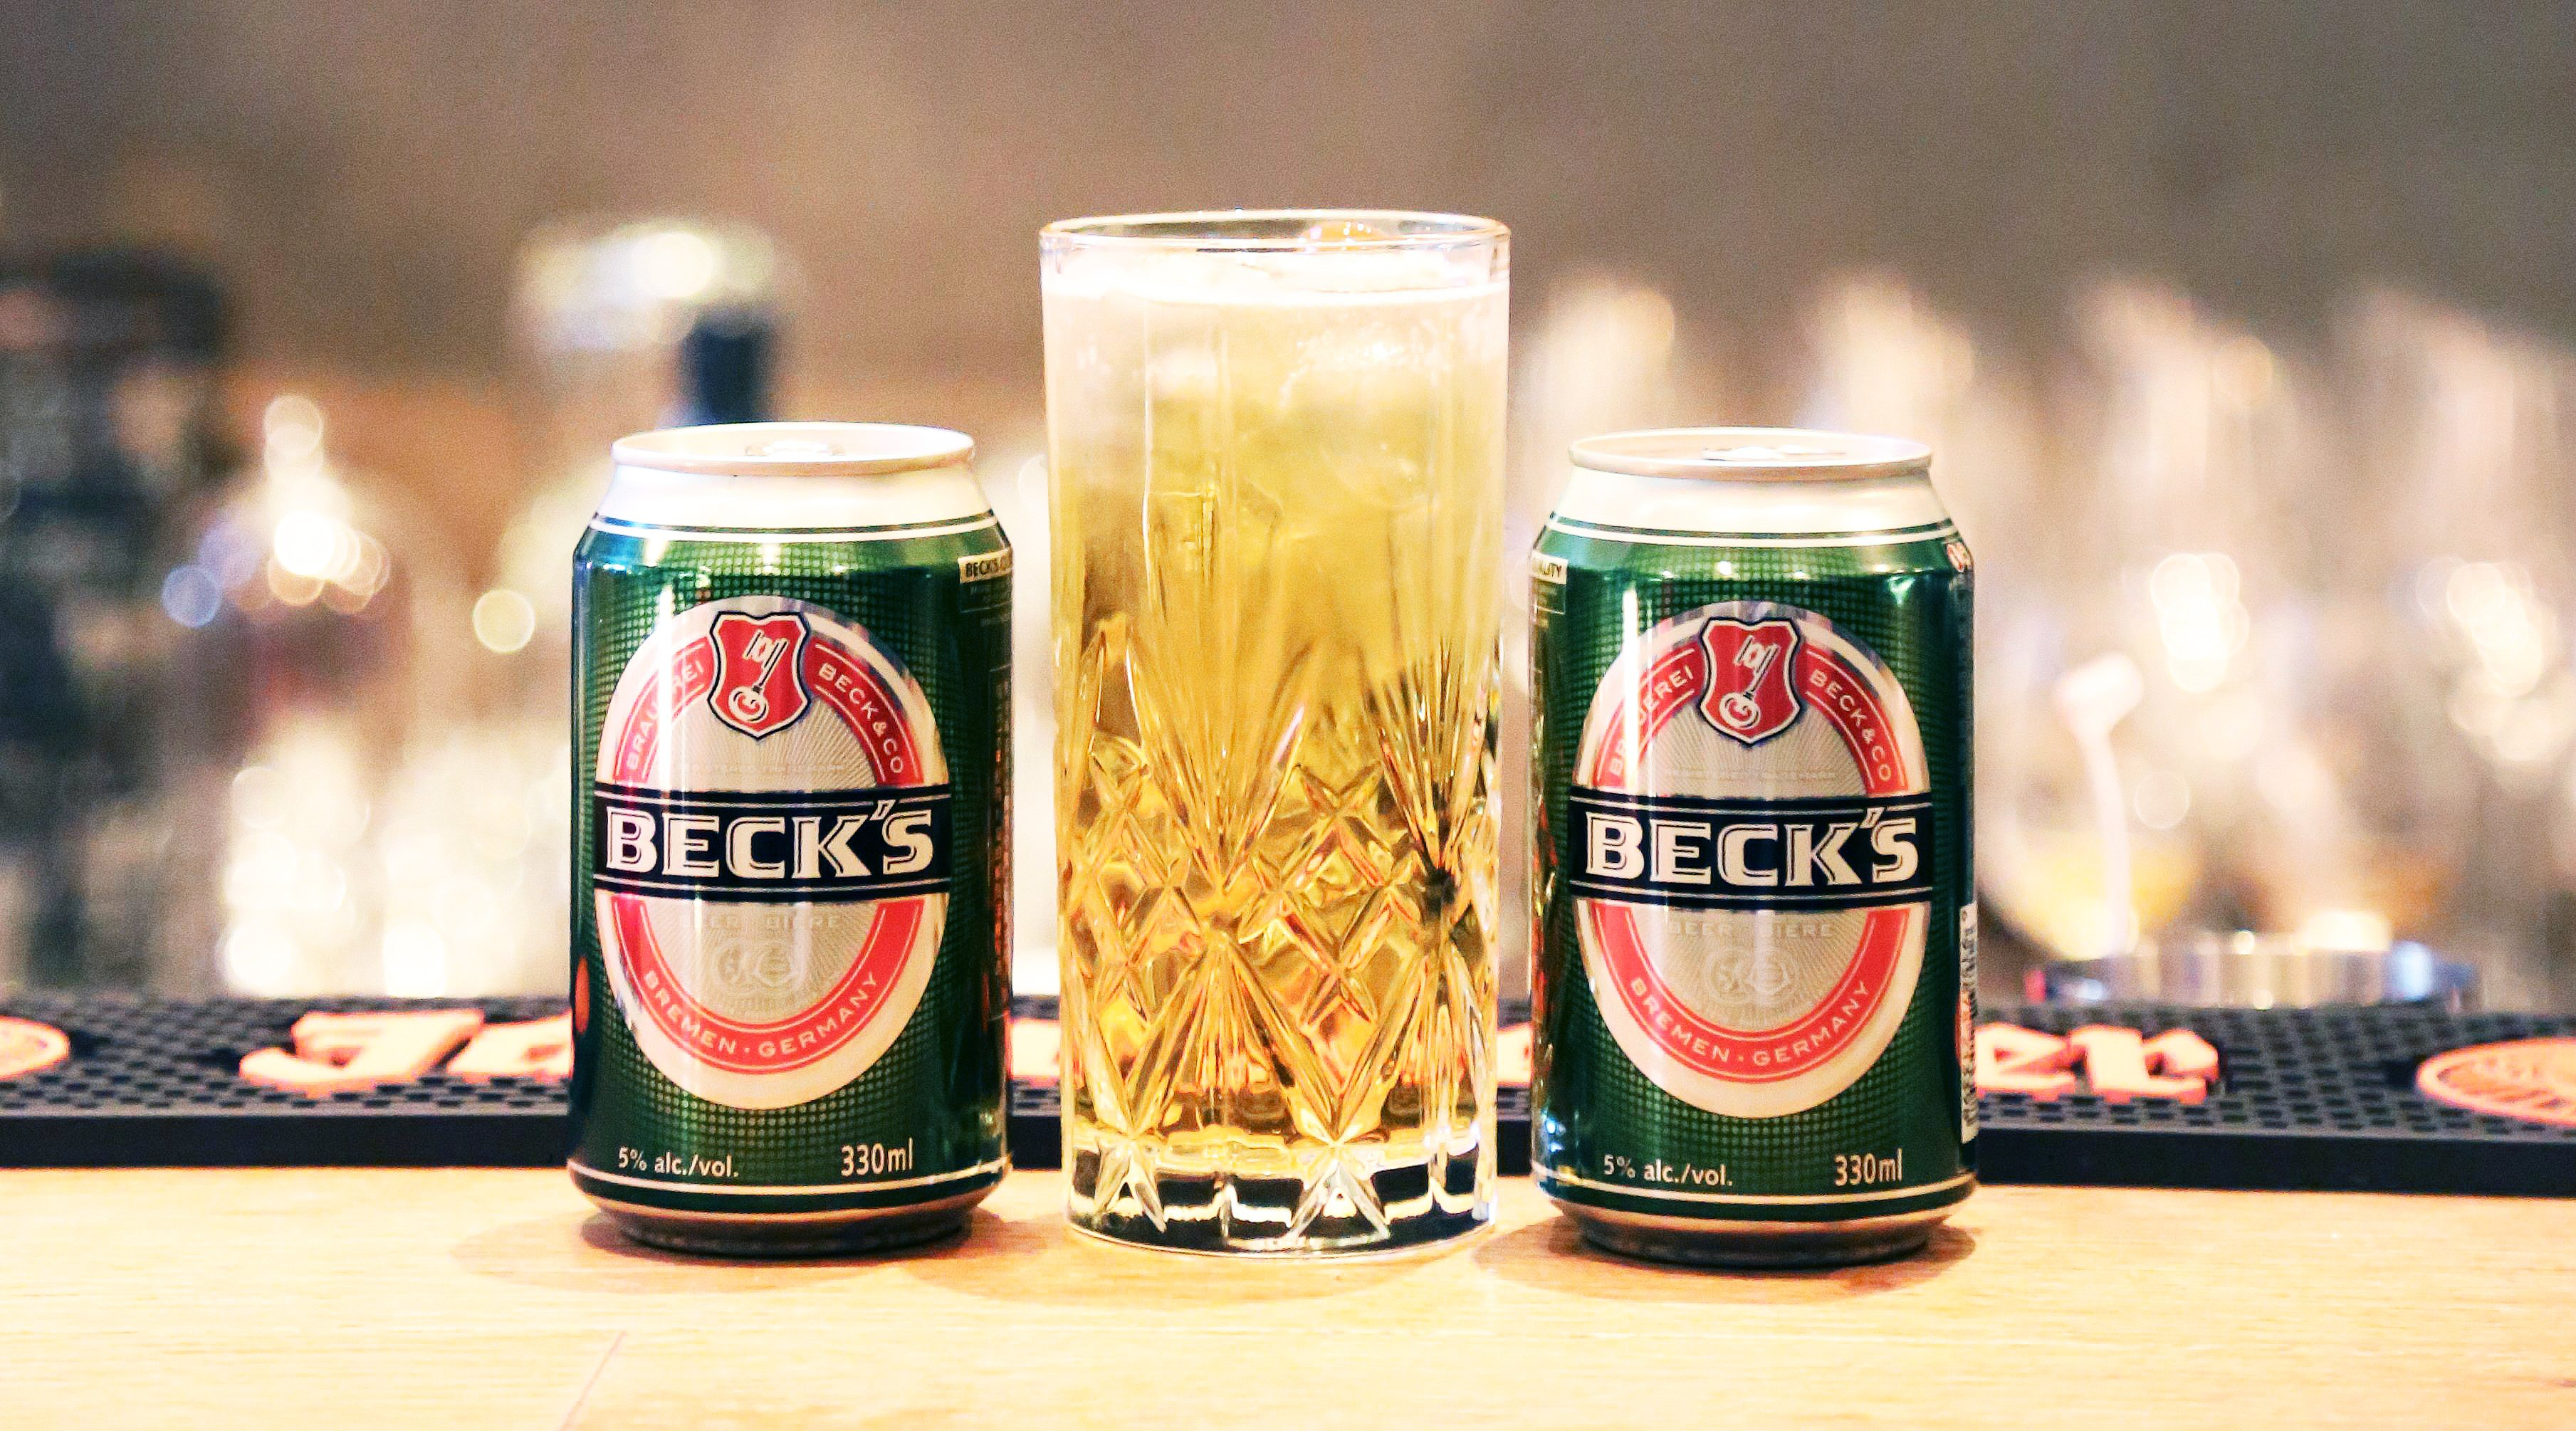 CHORD 和弦 BISTRO 信義安和站-BECK'S 德國釀造啤酒 | 買一送一